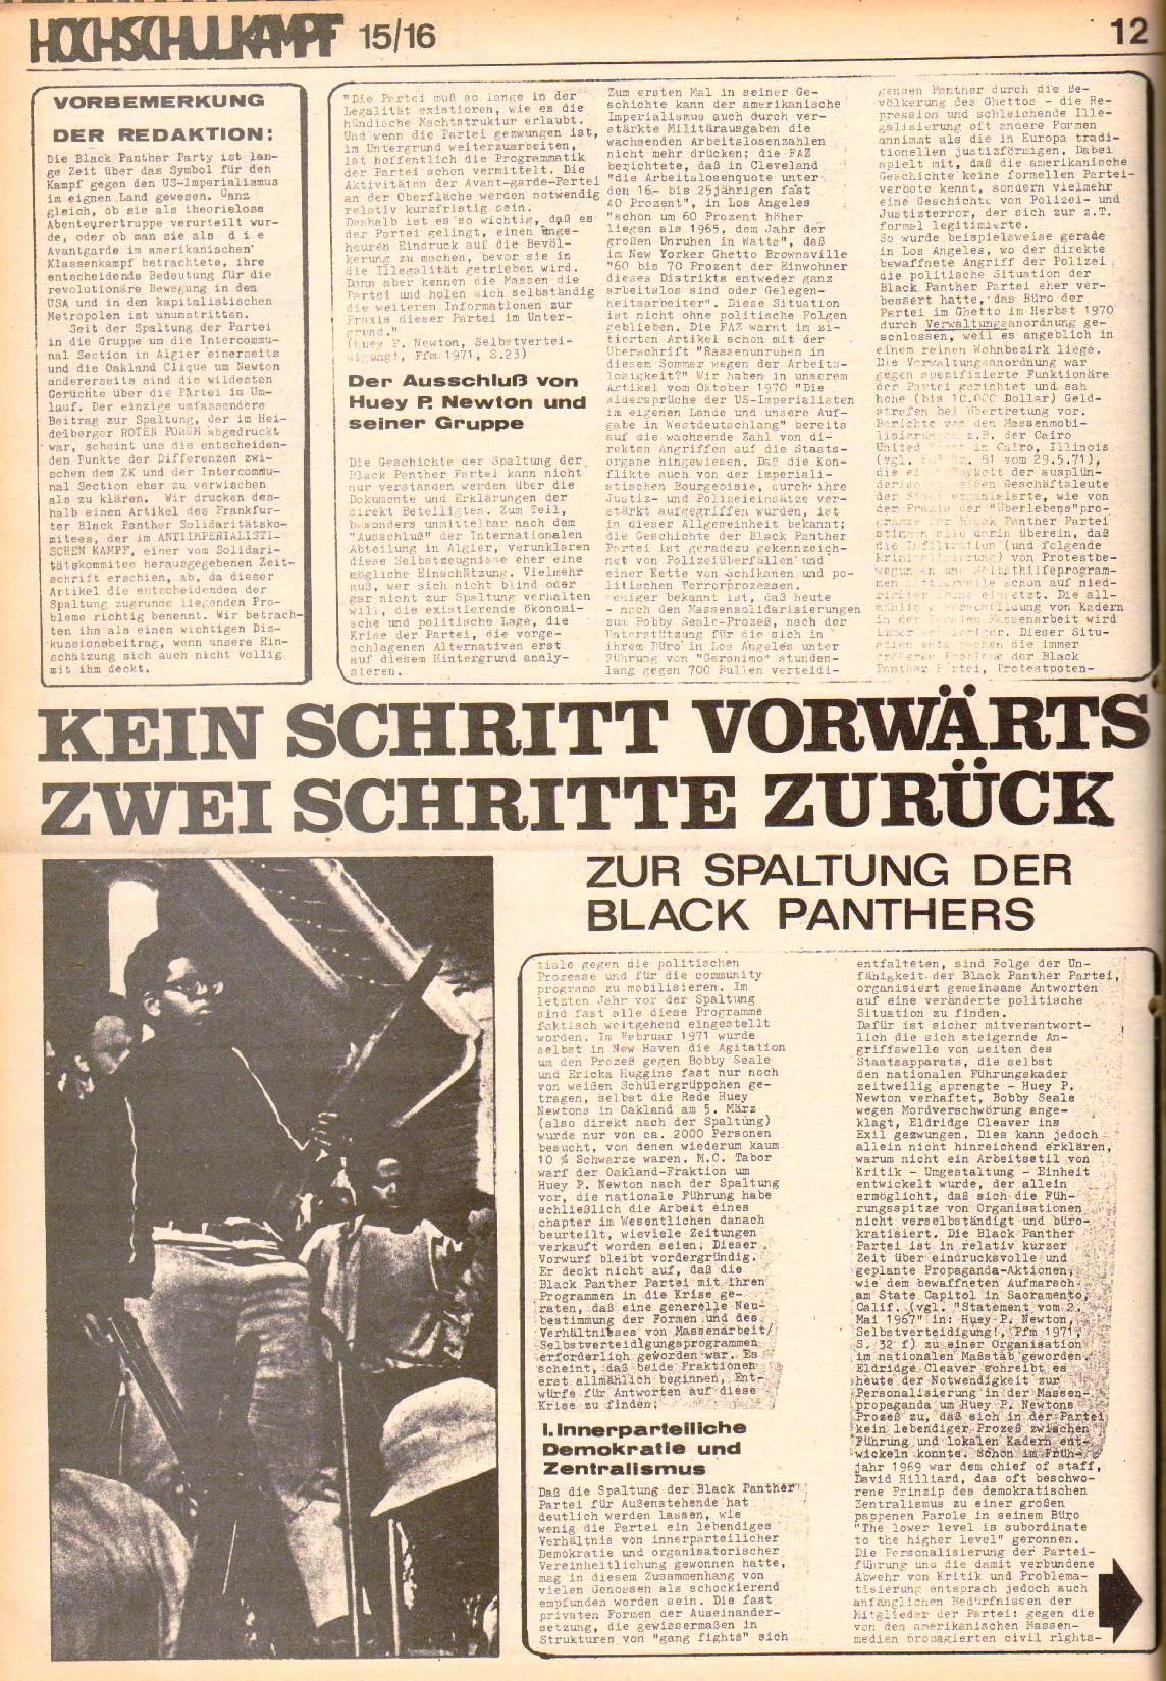 Berlin_Hochschulkampf_1971_15_12